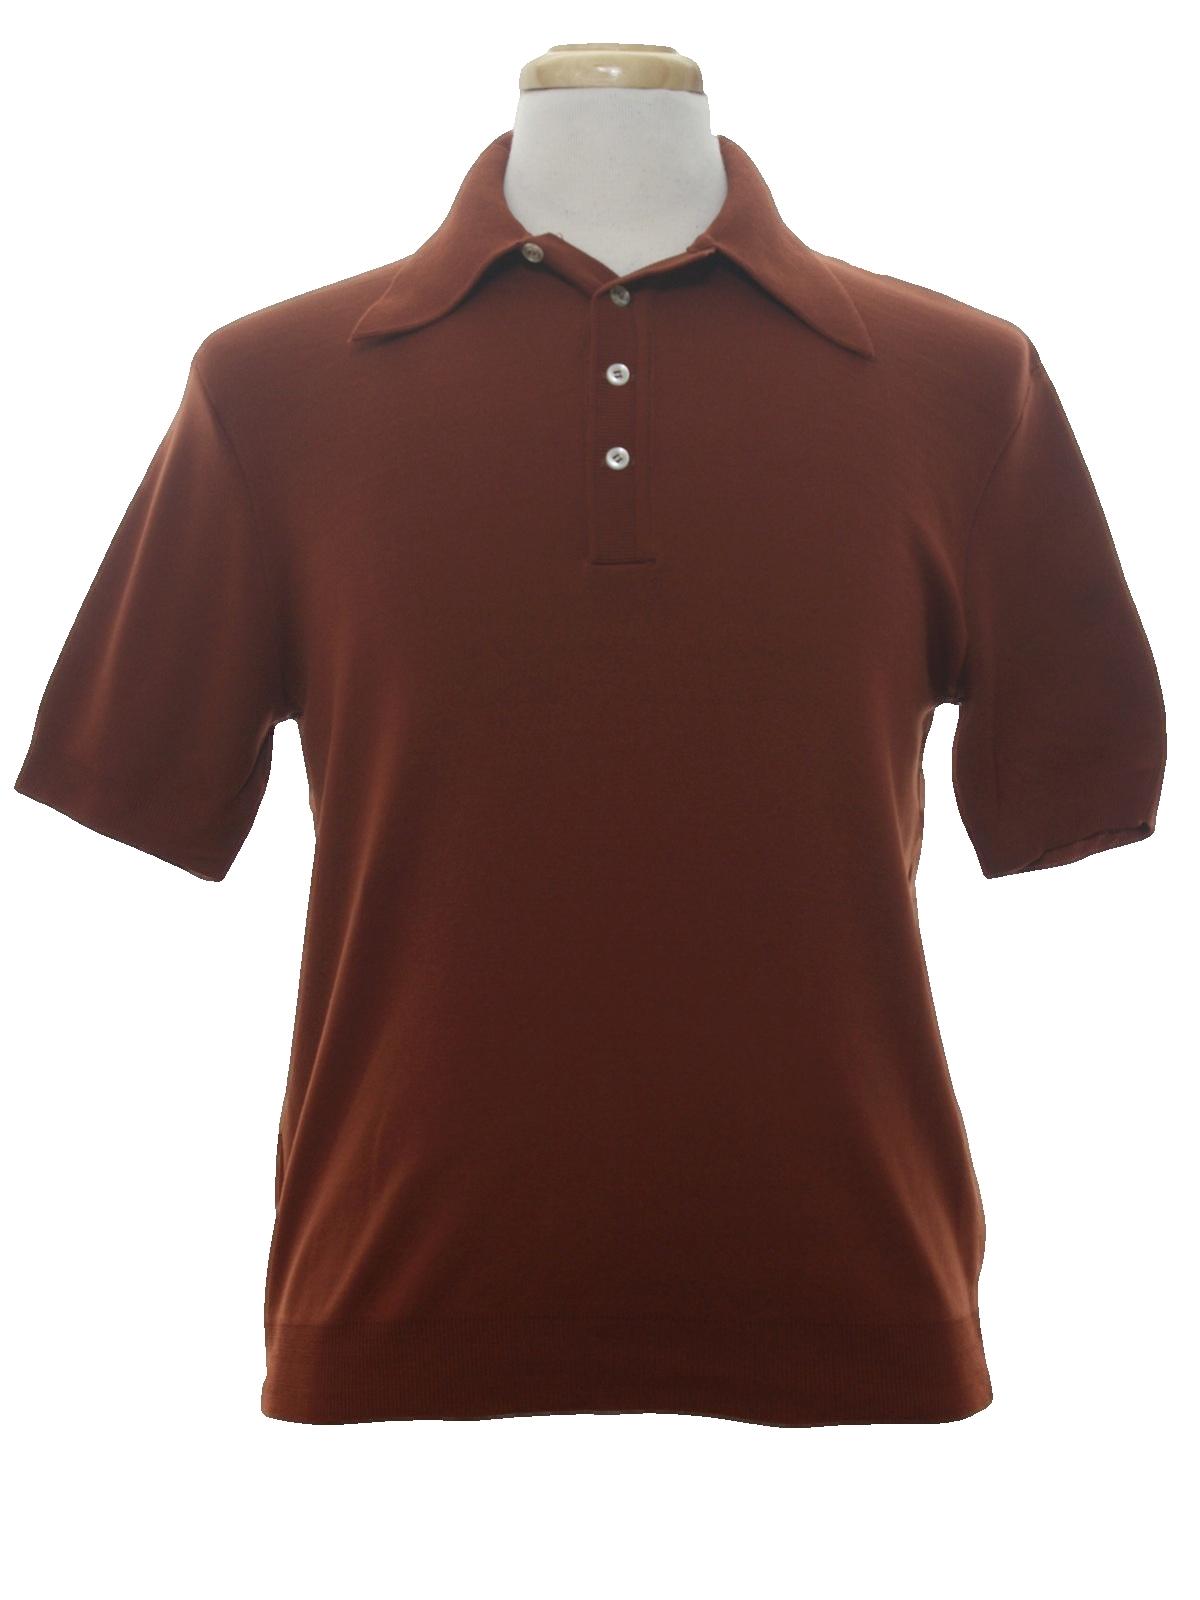 Vintage kmart 80 39 s knit shirt 80s kmart mens cinnamon for Kmart button up shirts